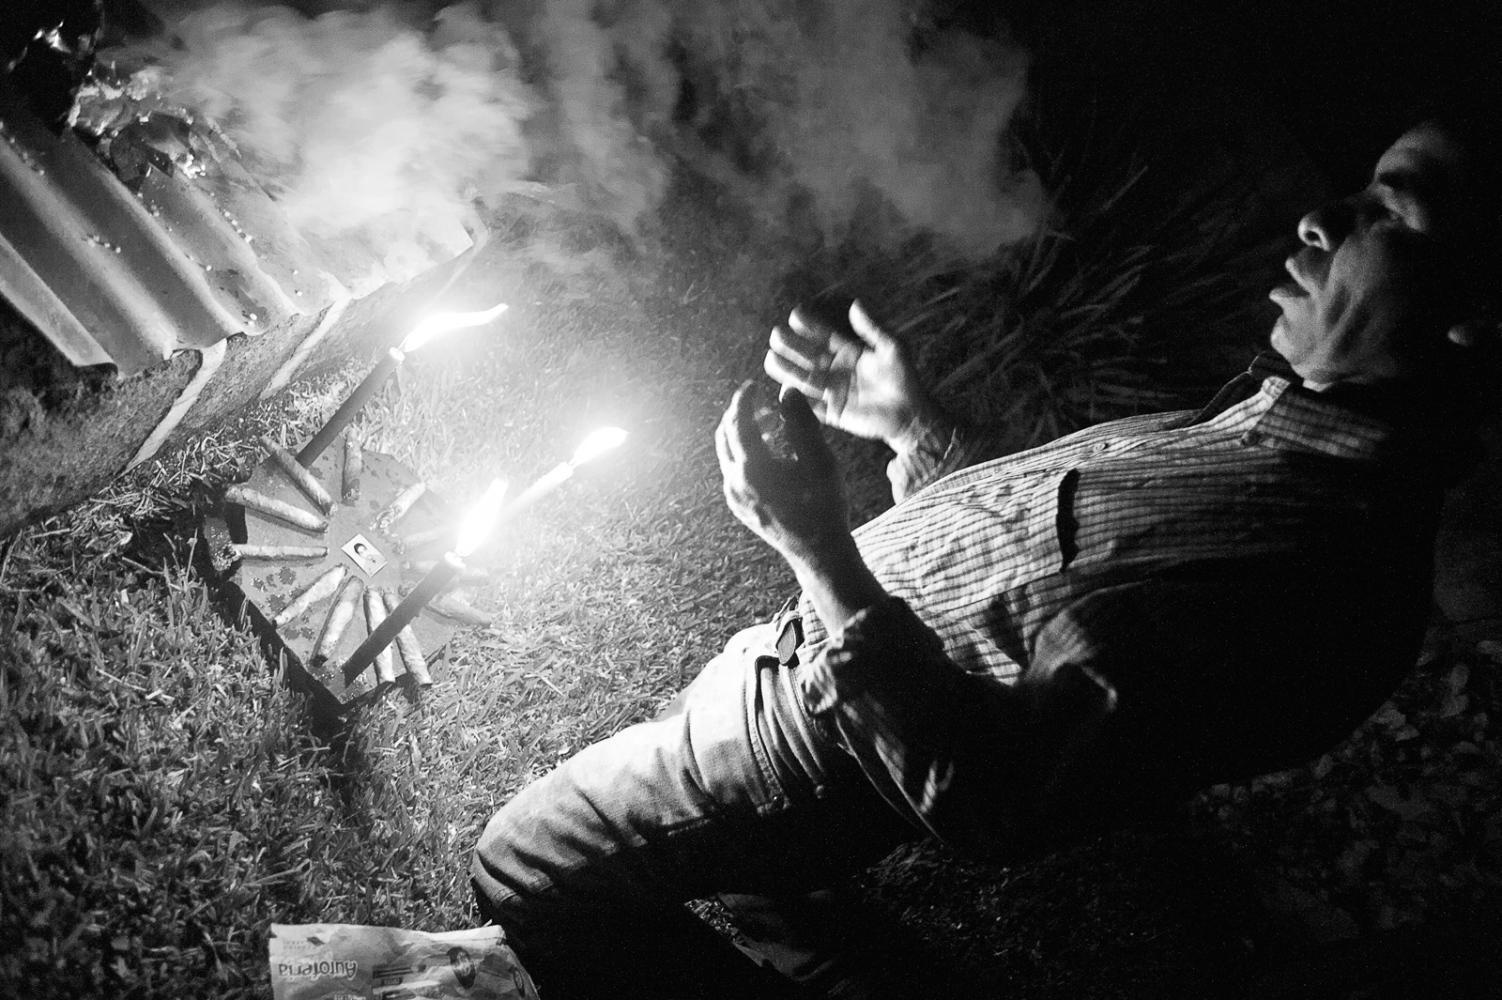 Diego Gonzalez, shaman and healerperforming a lakeside ritual healing